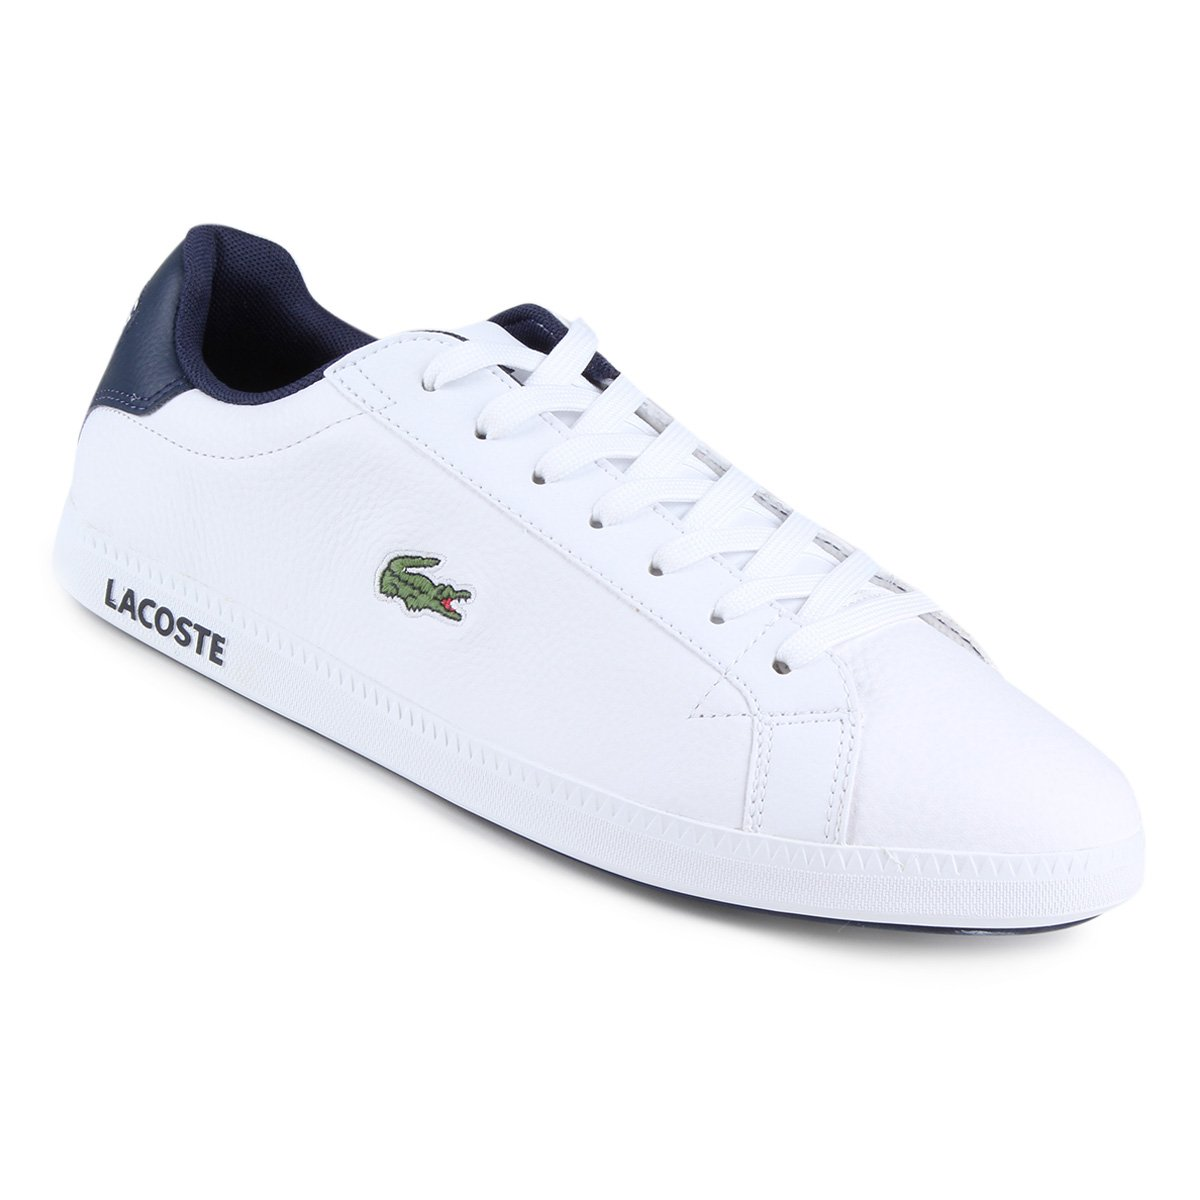 7c678213b68 Tênis Couro Lacoste Gradt Lcr3 Bkbk Masculino - Branco - Compre Agora